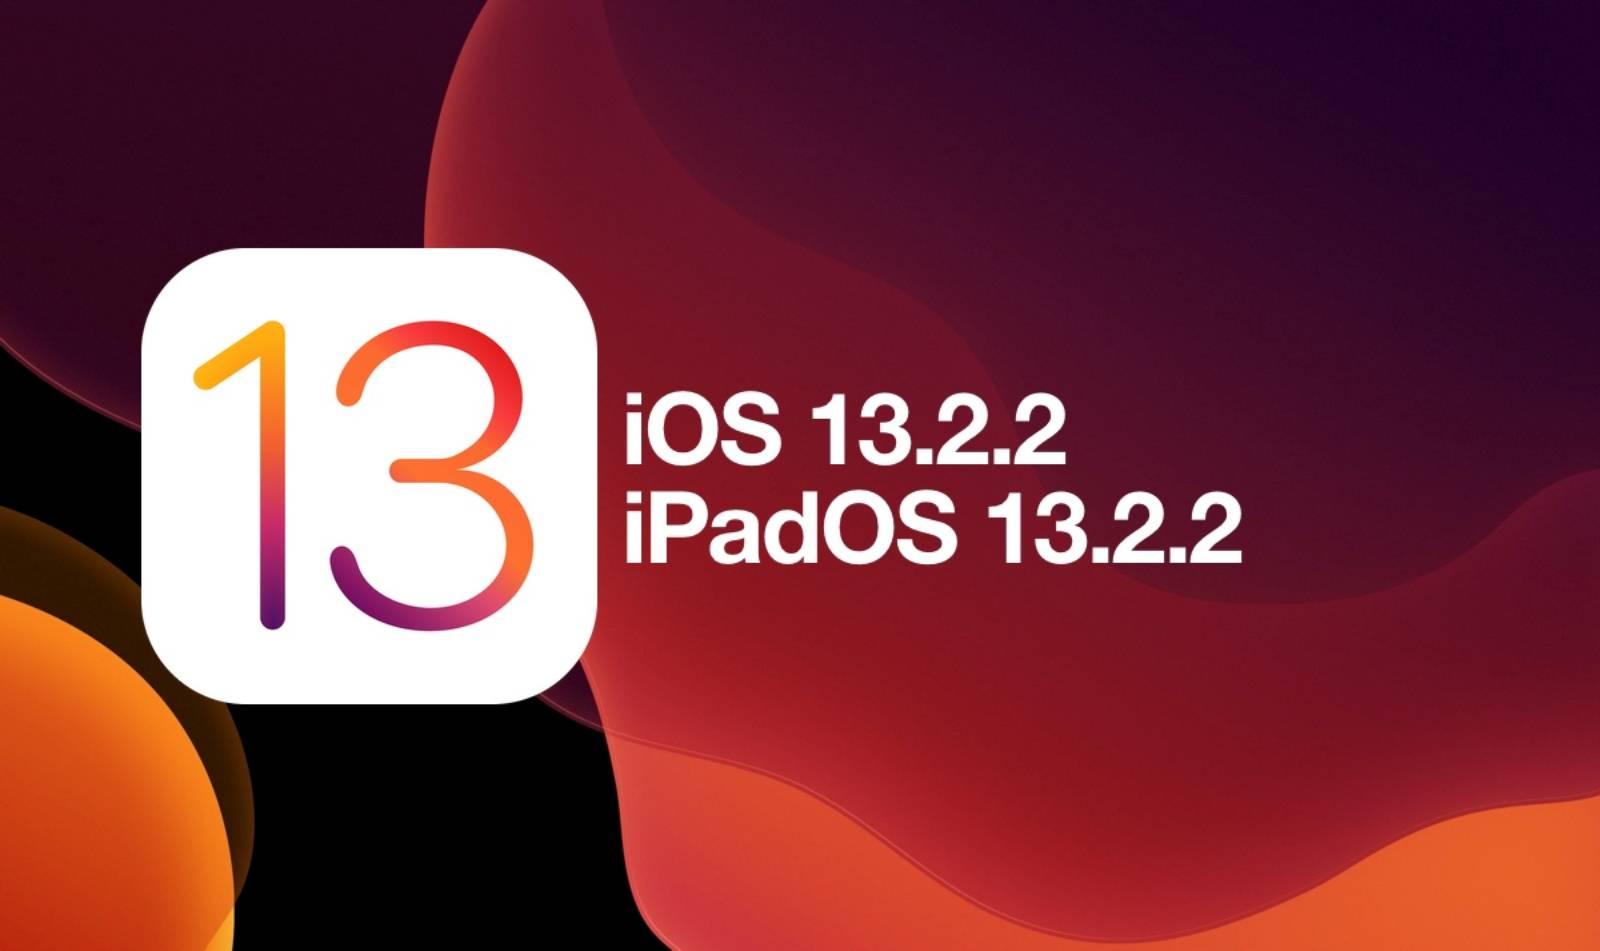 iOS 13.2.2 PROBLME Semnal iPhone Multitasking